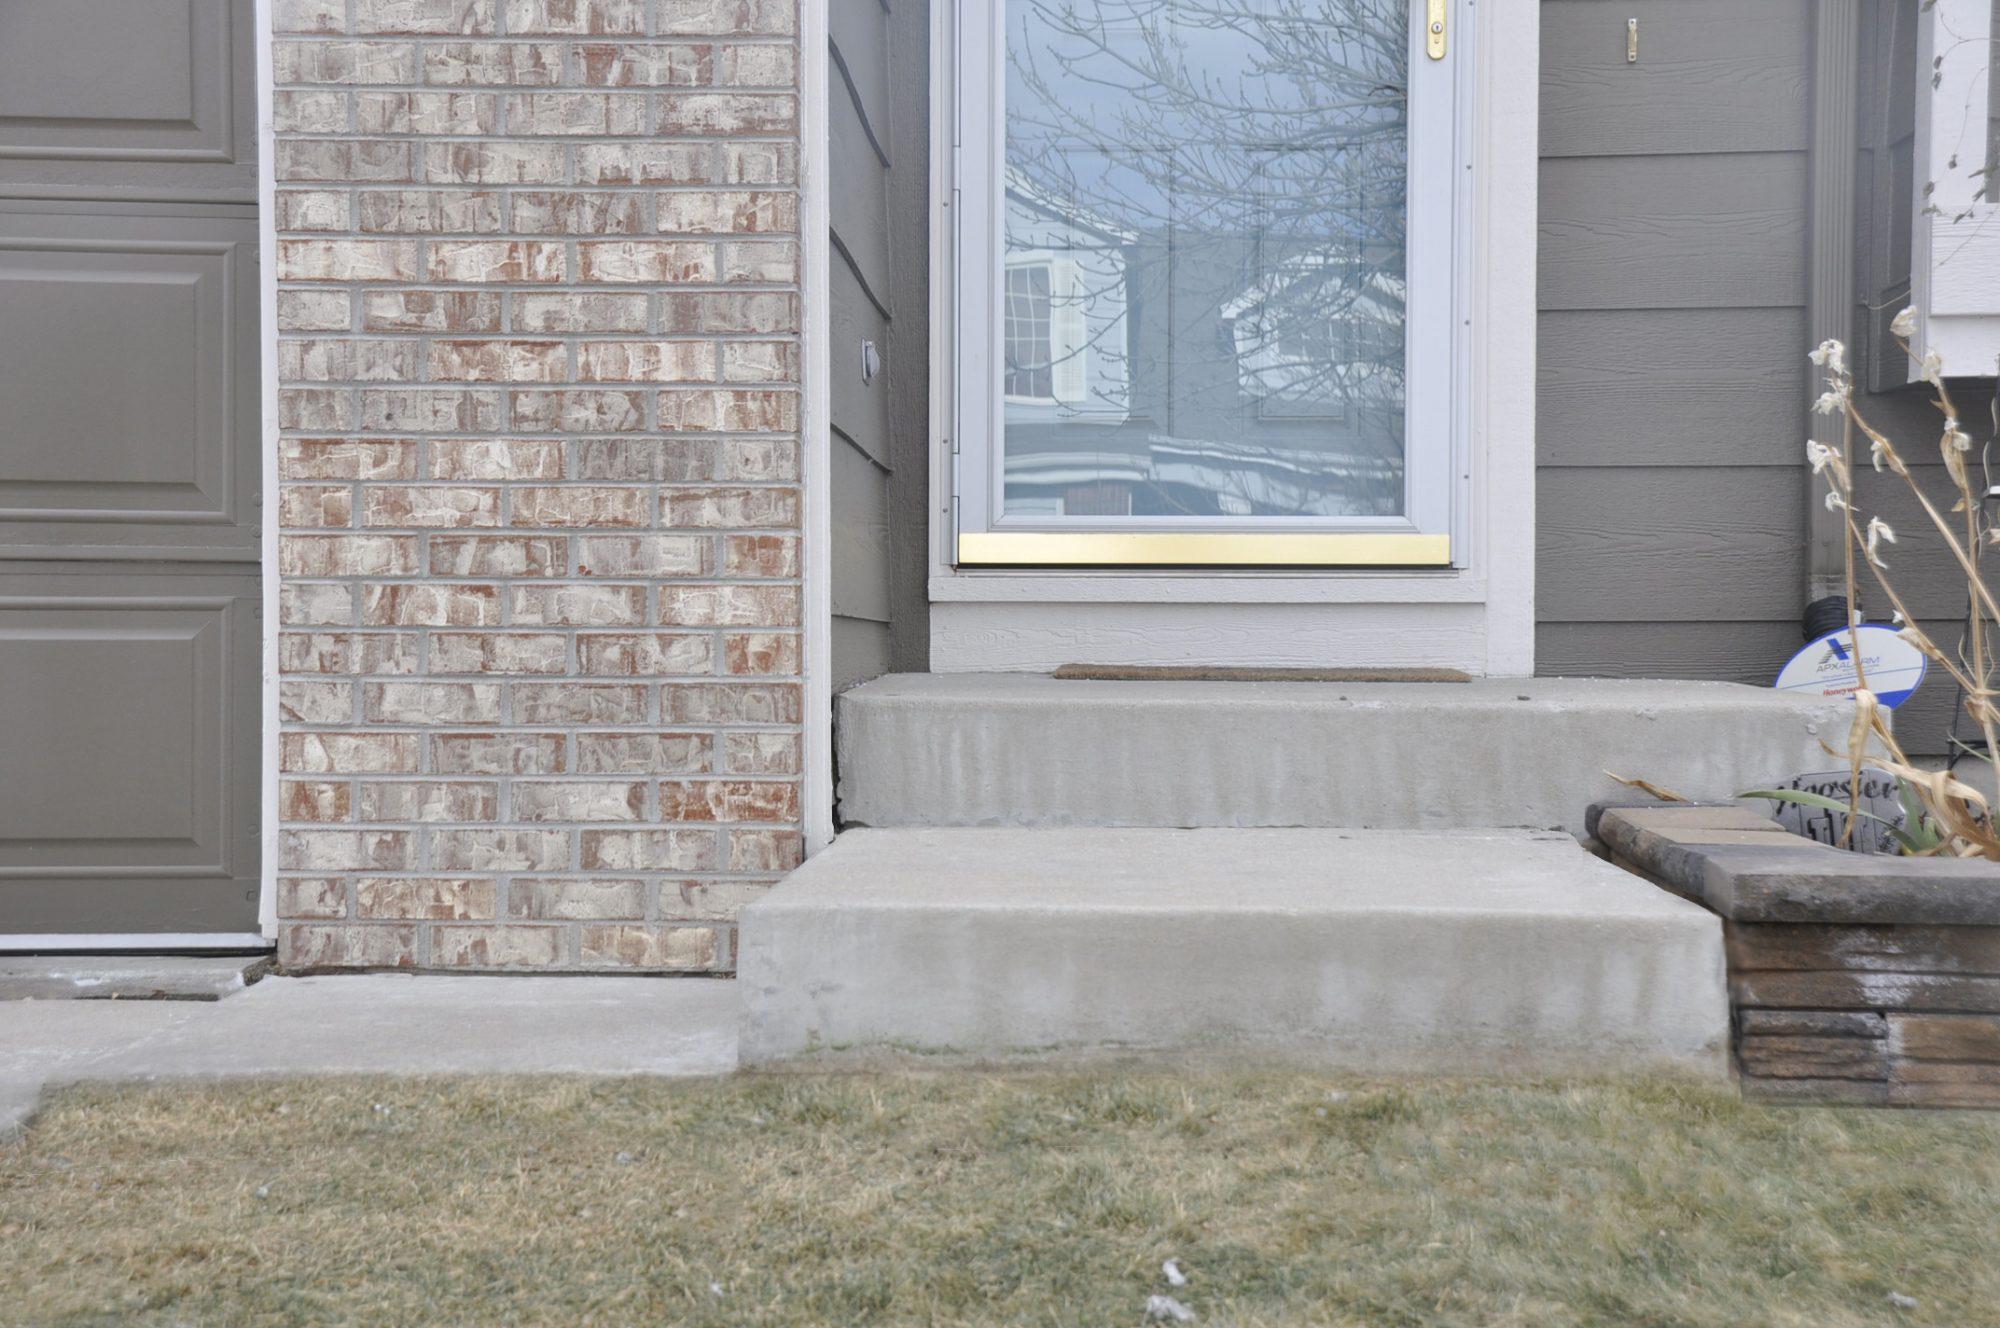 Concrete porch repaired by Liftech, a concrete raising company